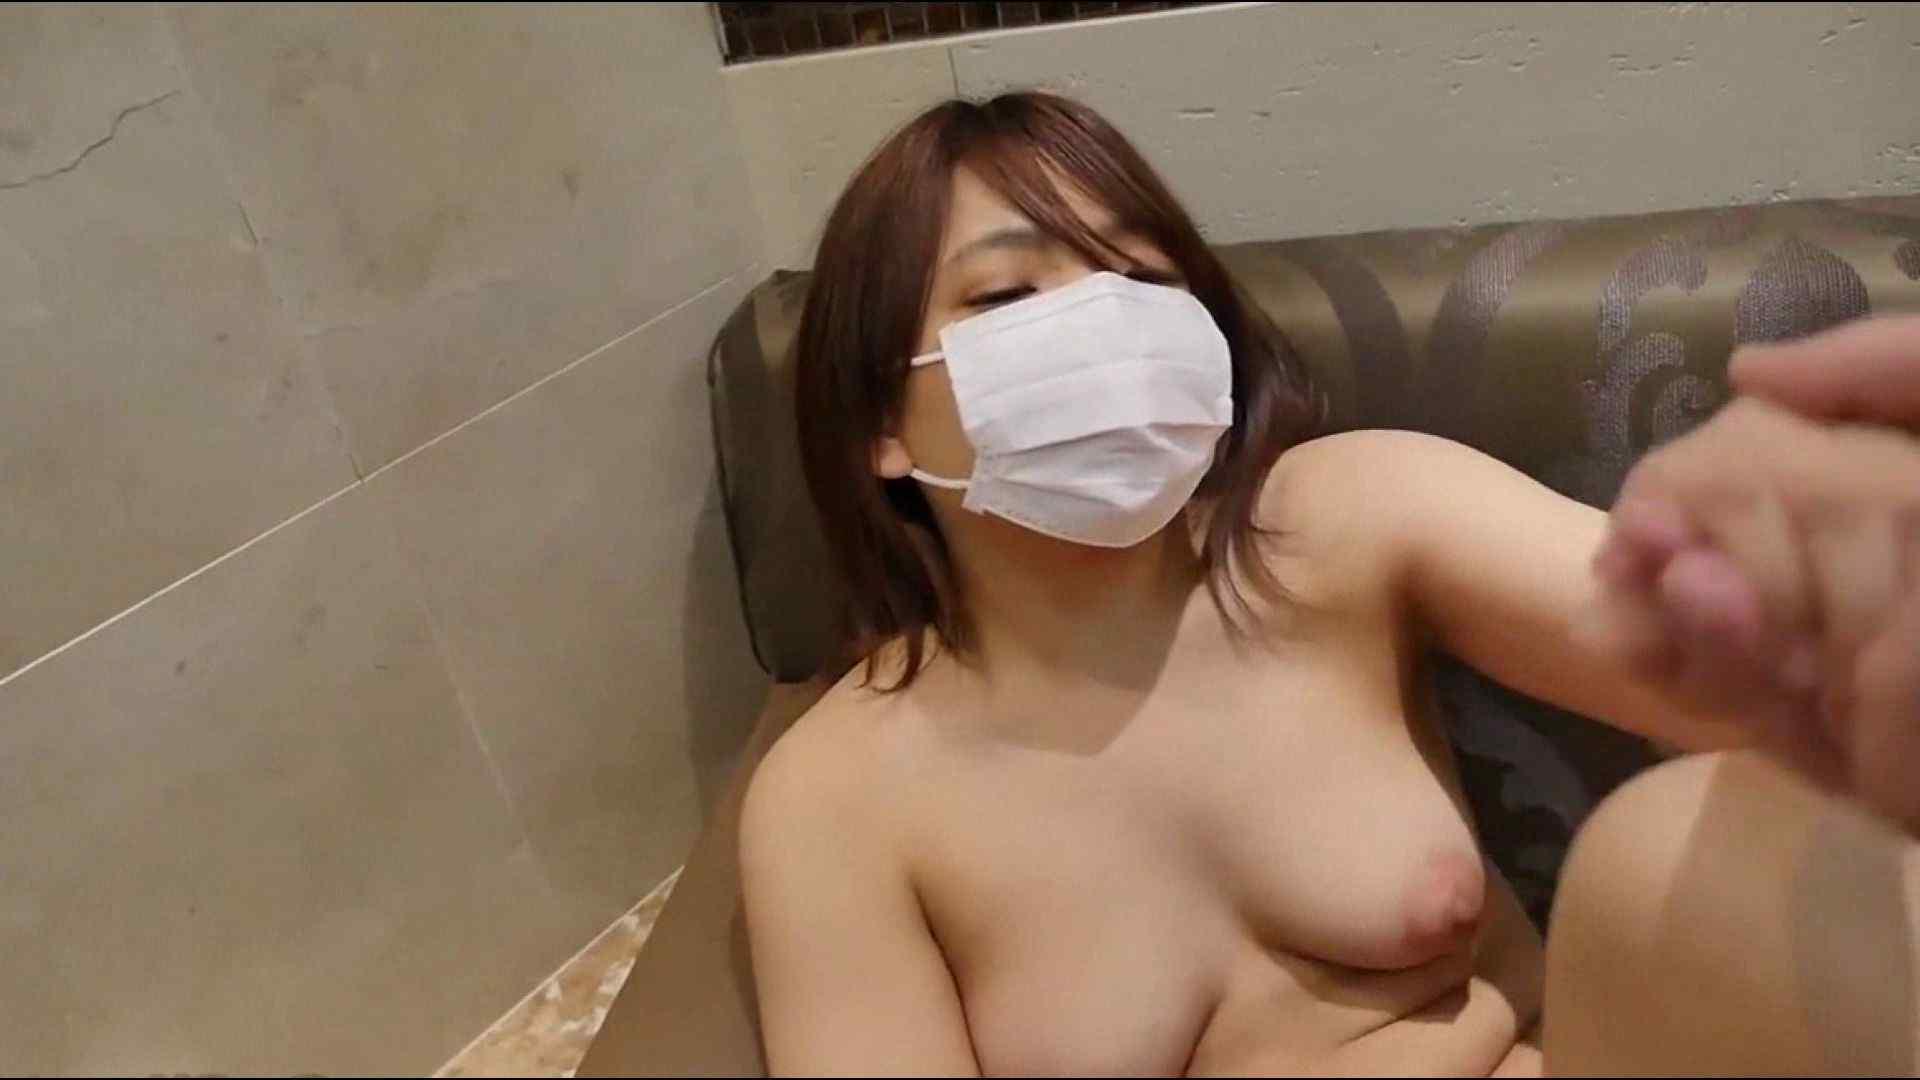 S級厳選美女ビッチガールVol.41 前編 美女 | OLの実態  83pic 23